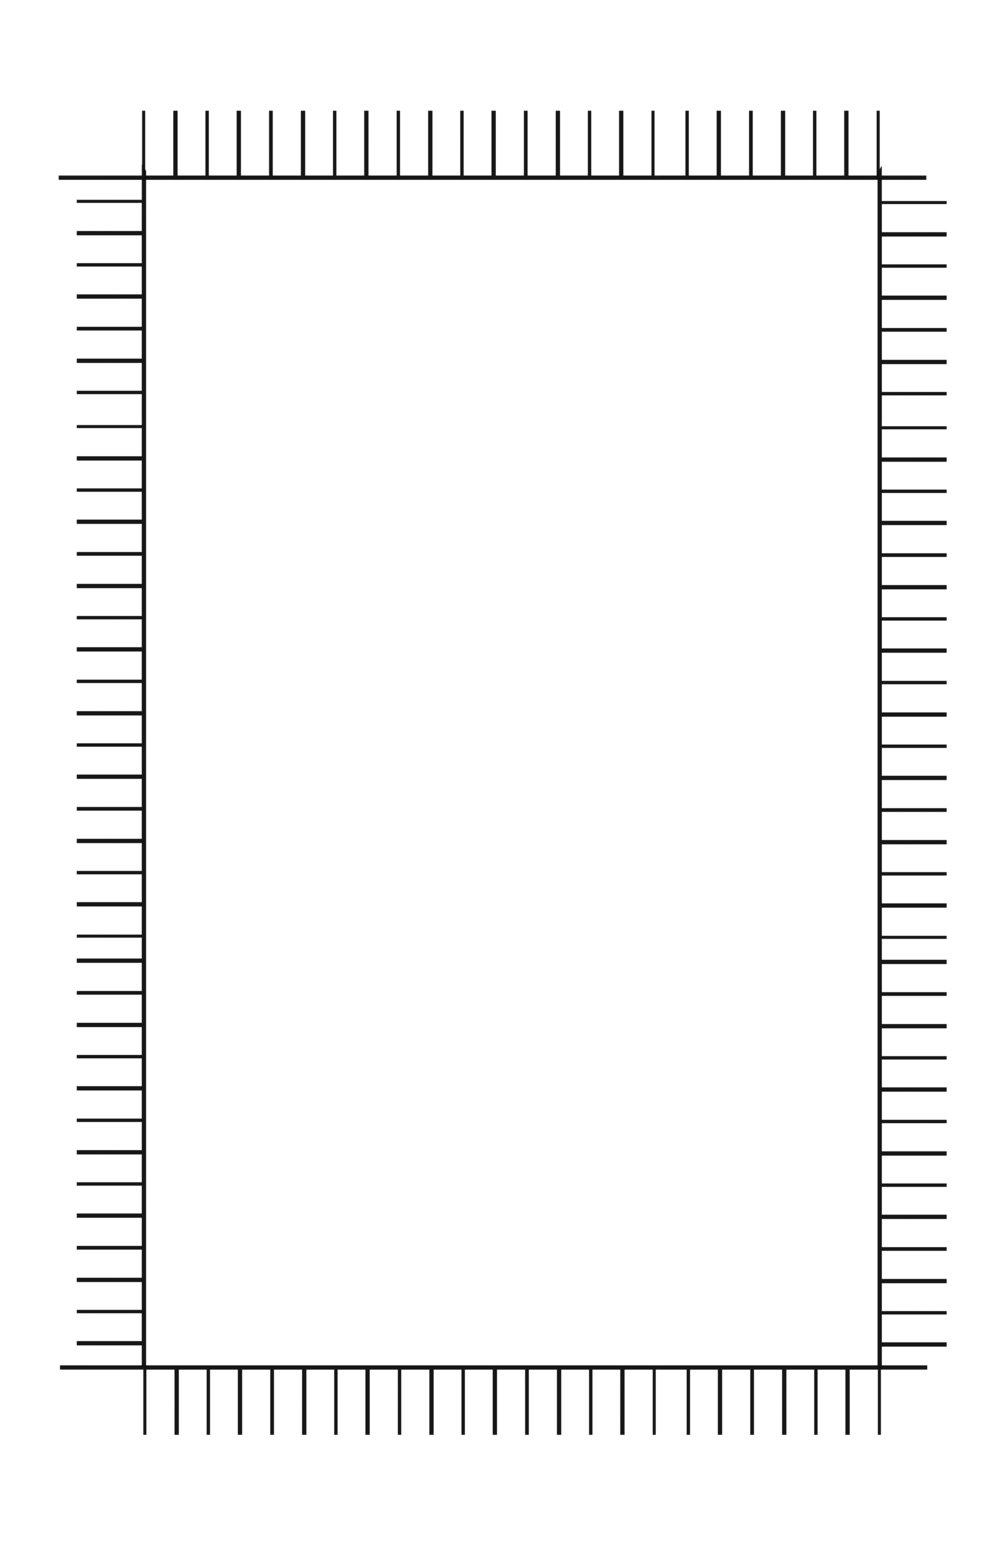 Blank comic grid